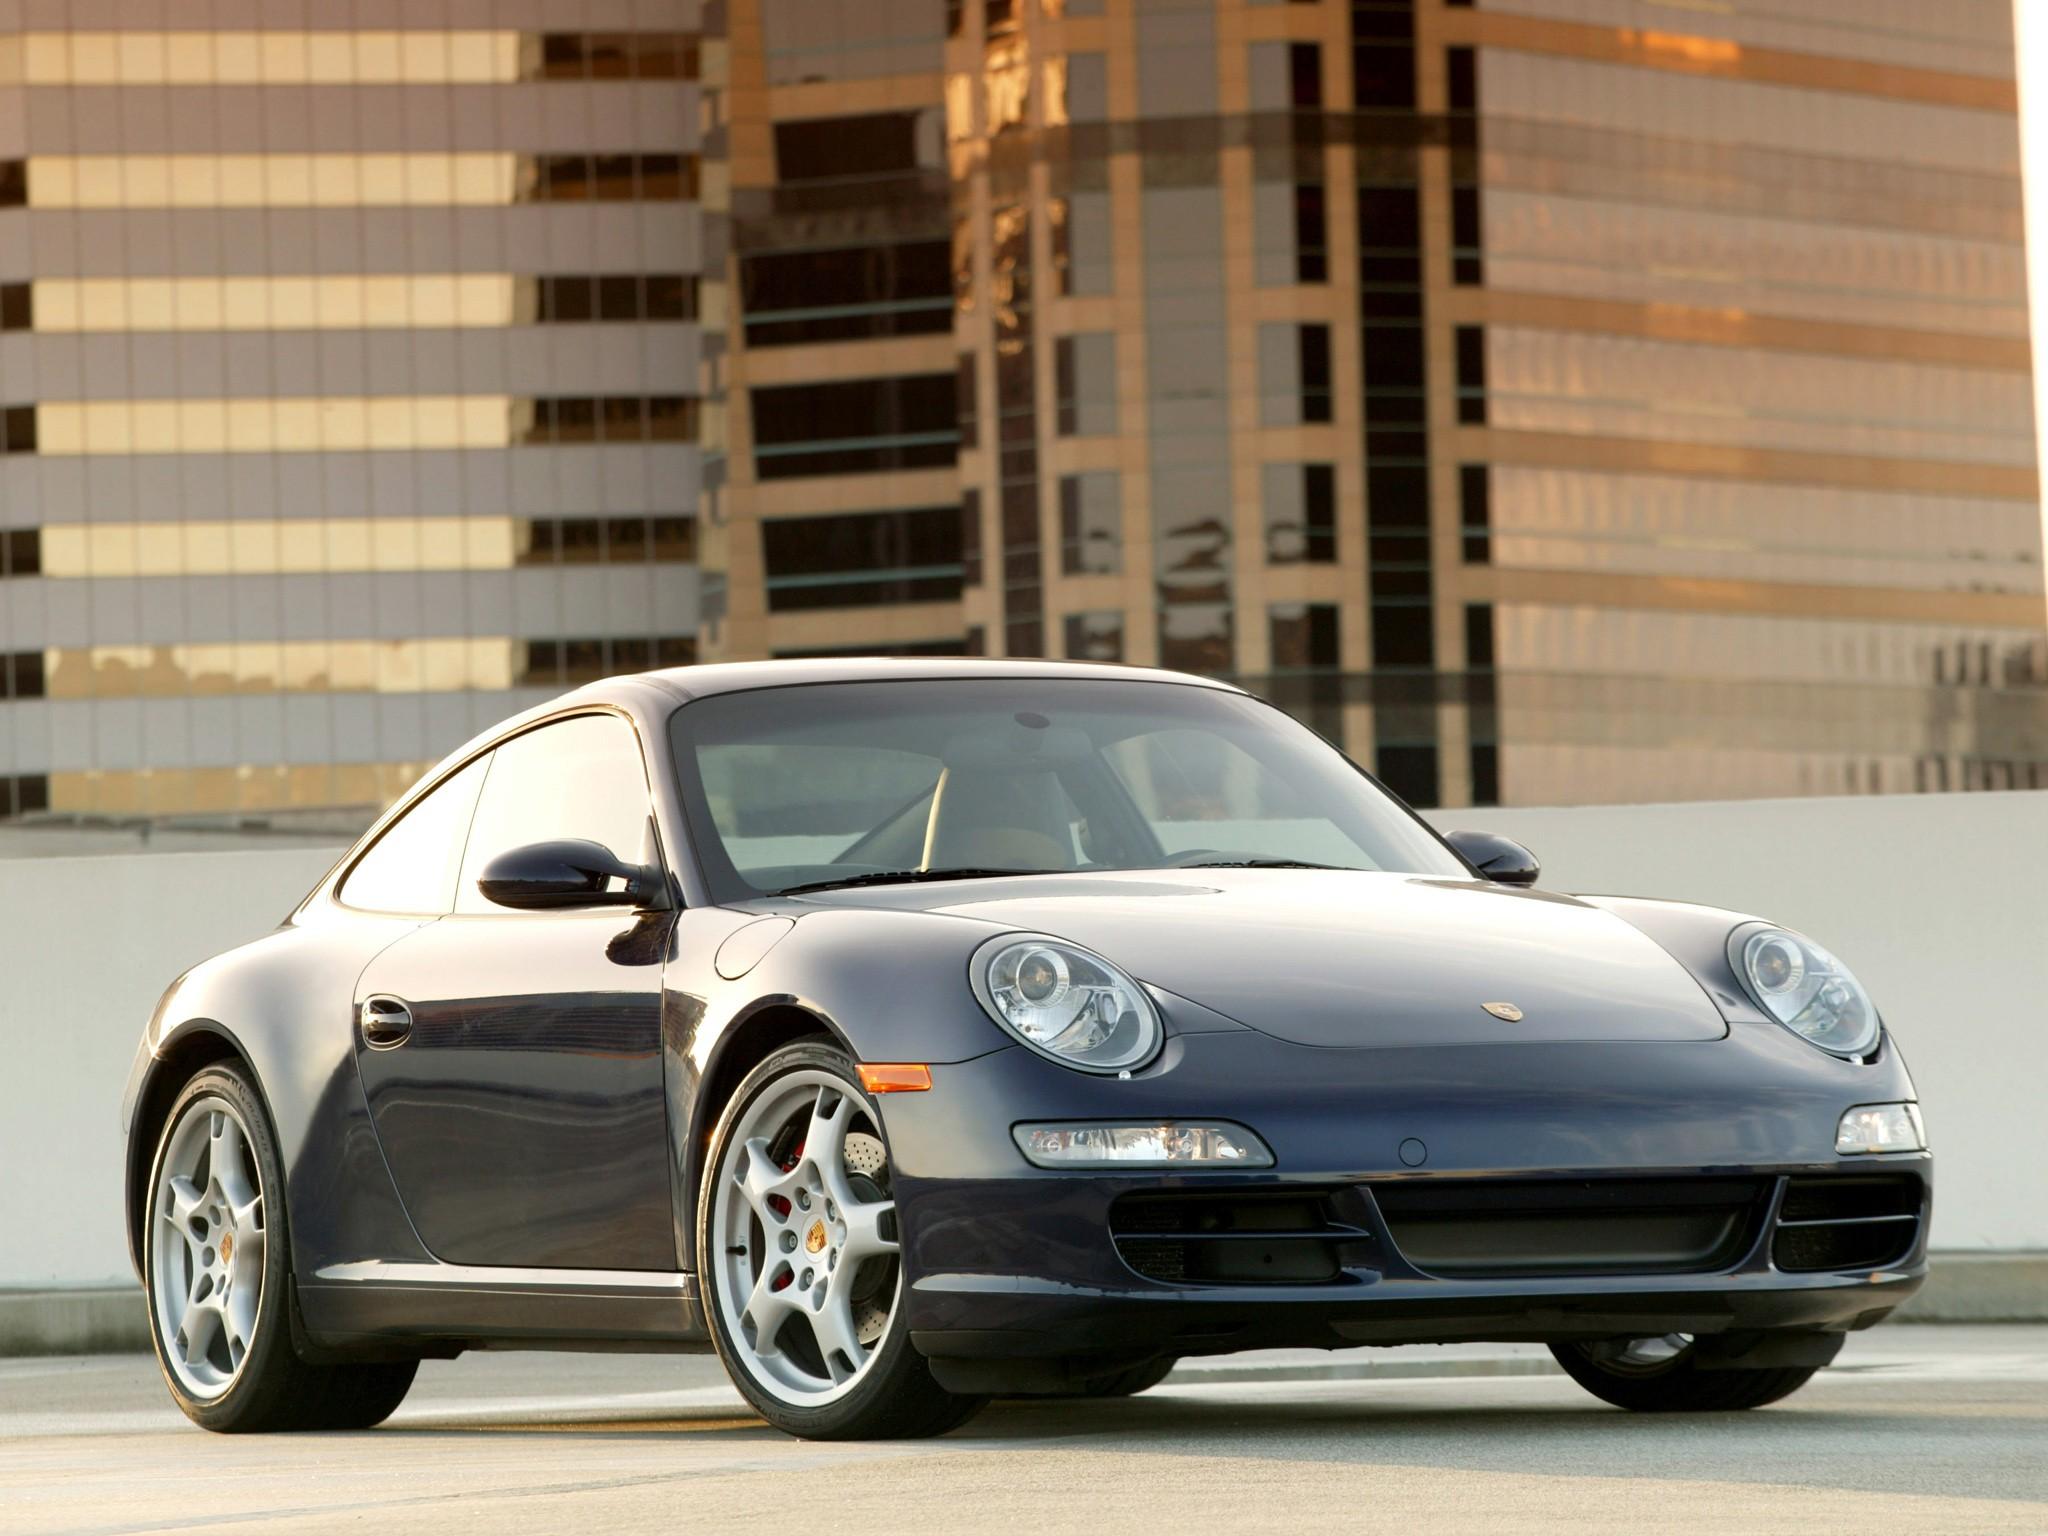 porsche 911 carrera s 997 specs 2004 2005 2006 2007 2008 autoevolution. Black Bedroom Furniture Sets. Home Design Ideas